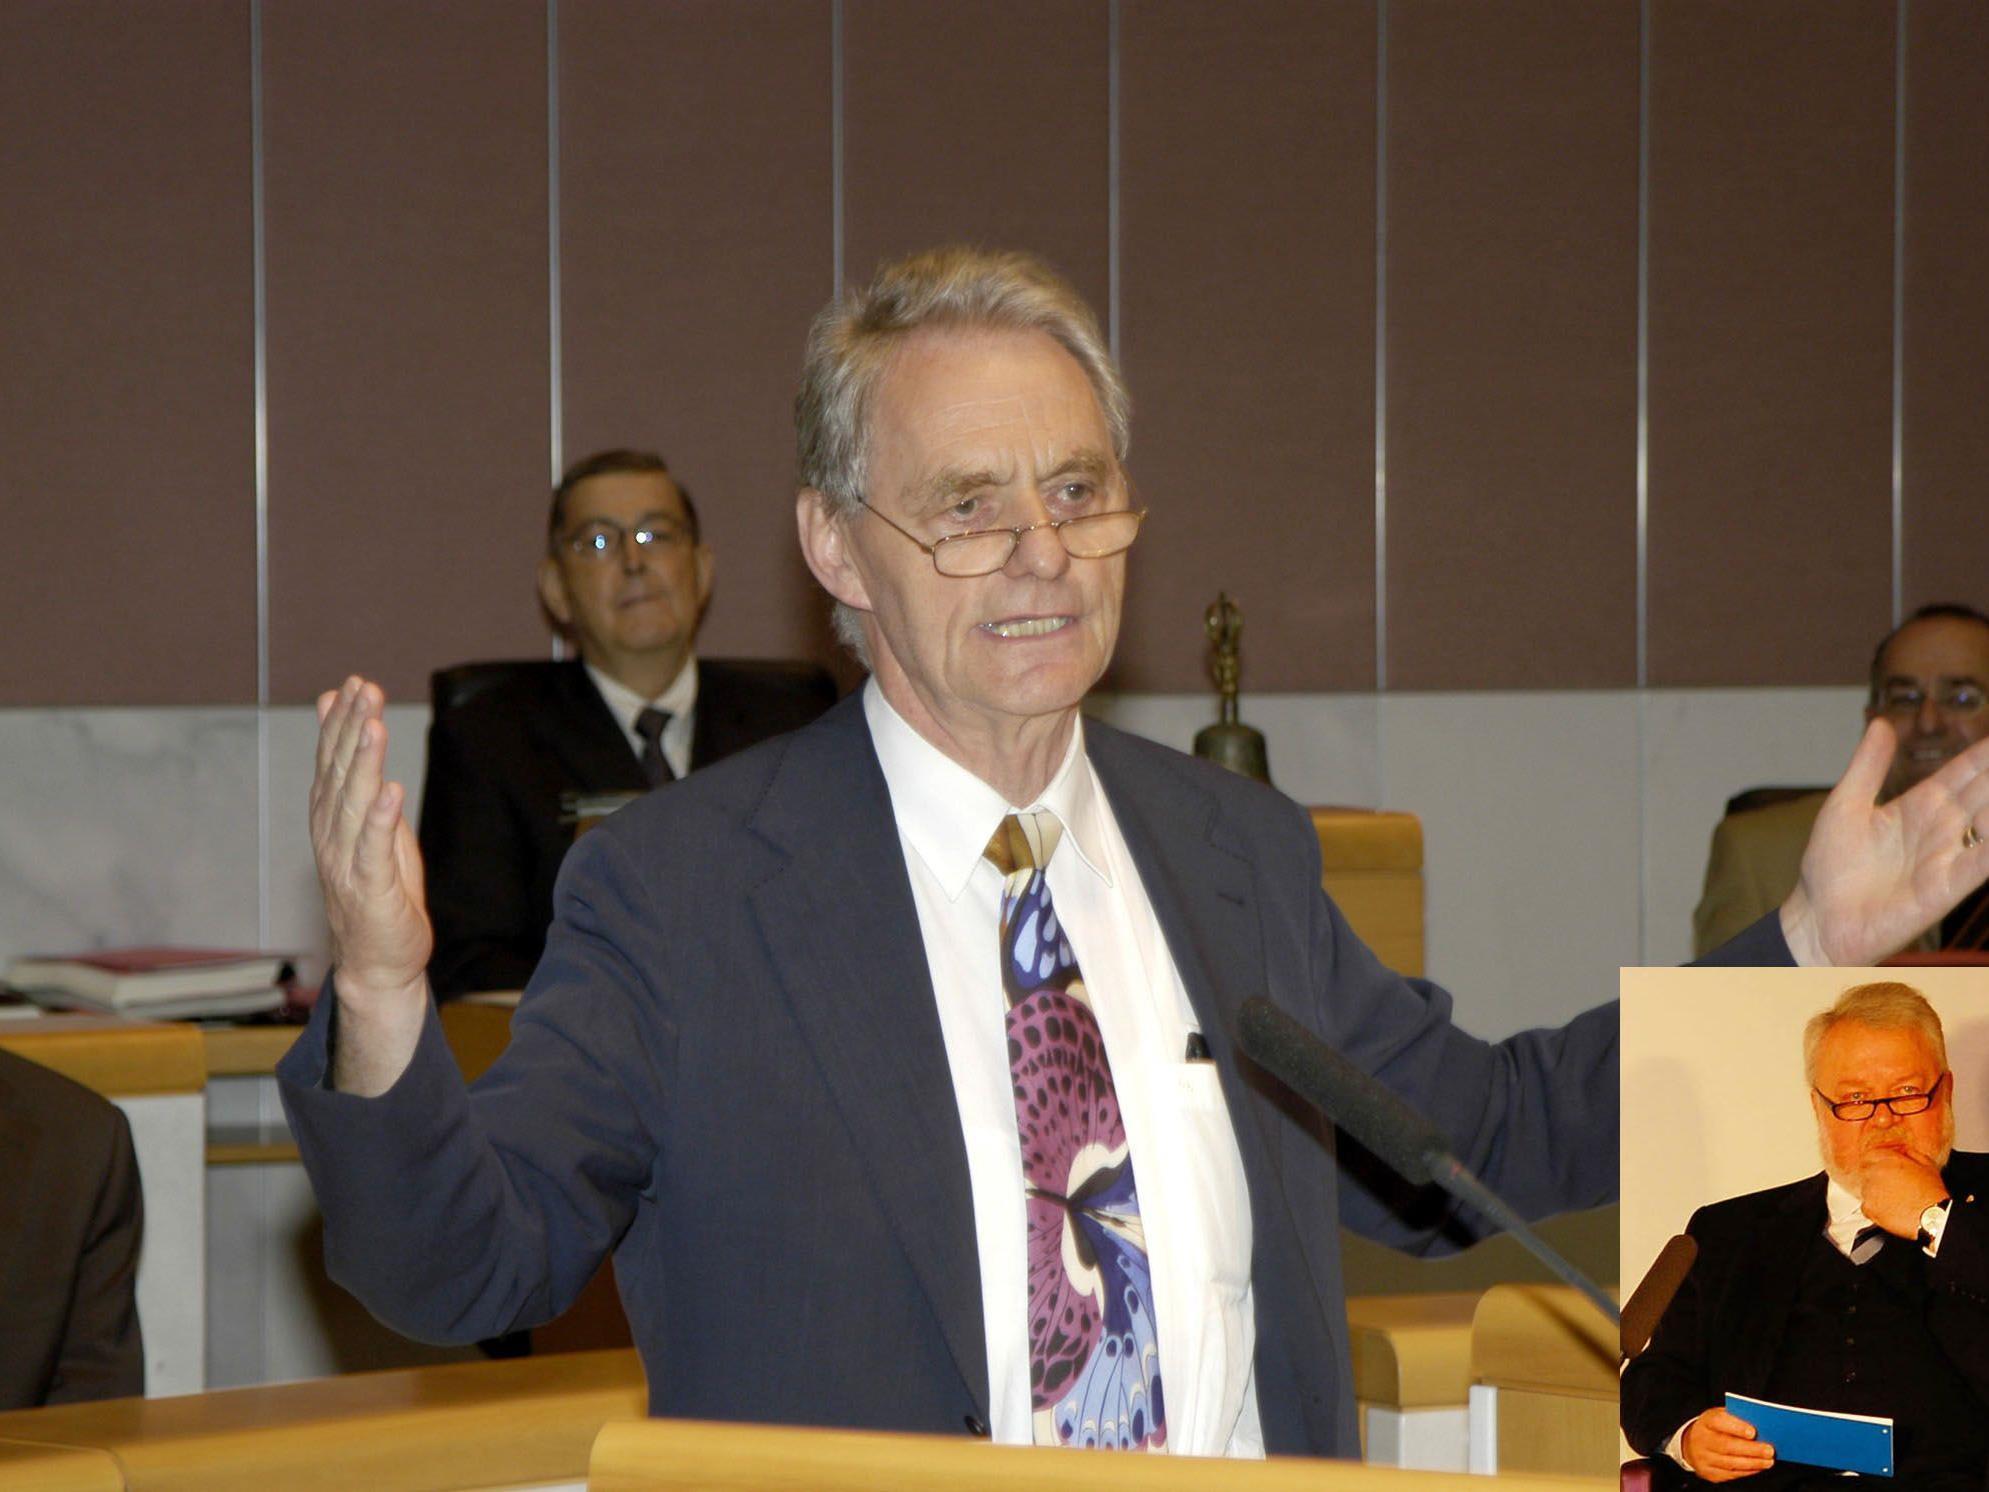 Elmar Oberhauser (kl. Bild) hat Günther Keckeis als Zeitzeuge zu Gast.